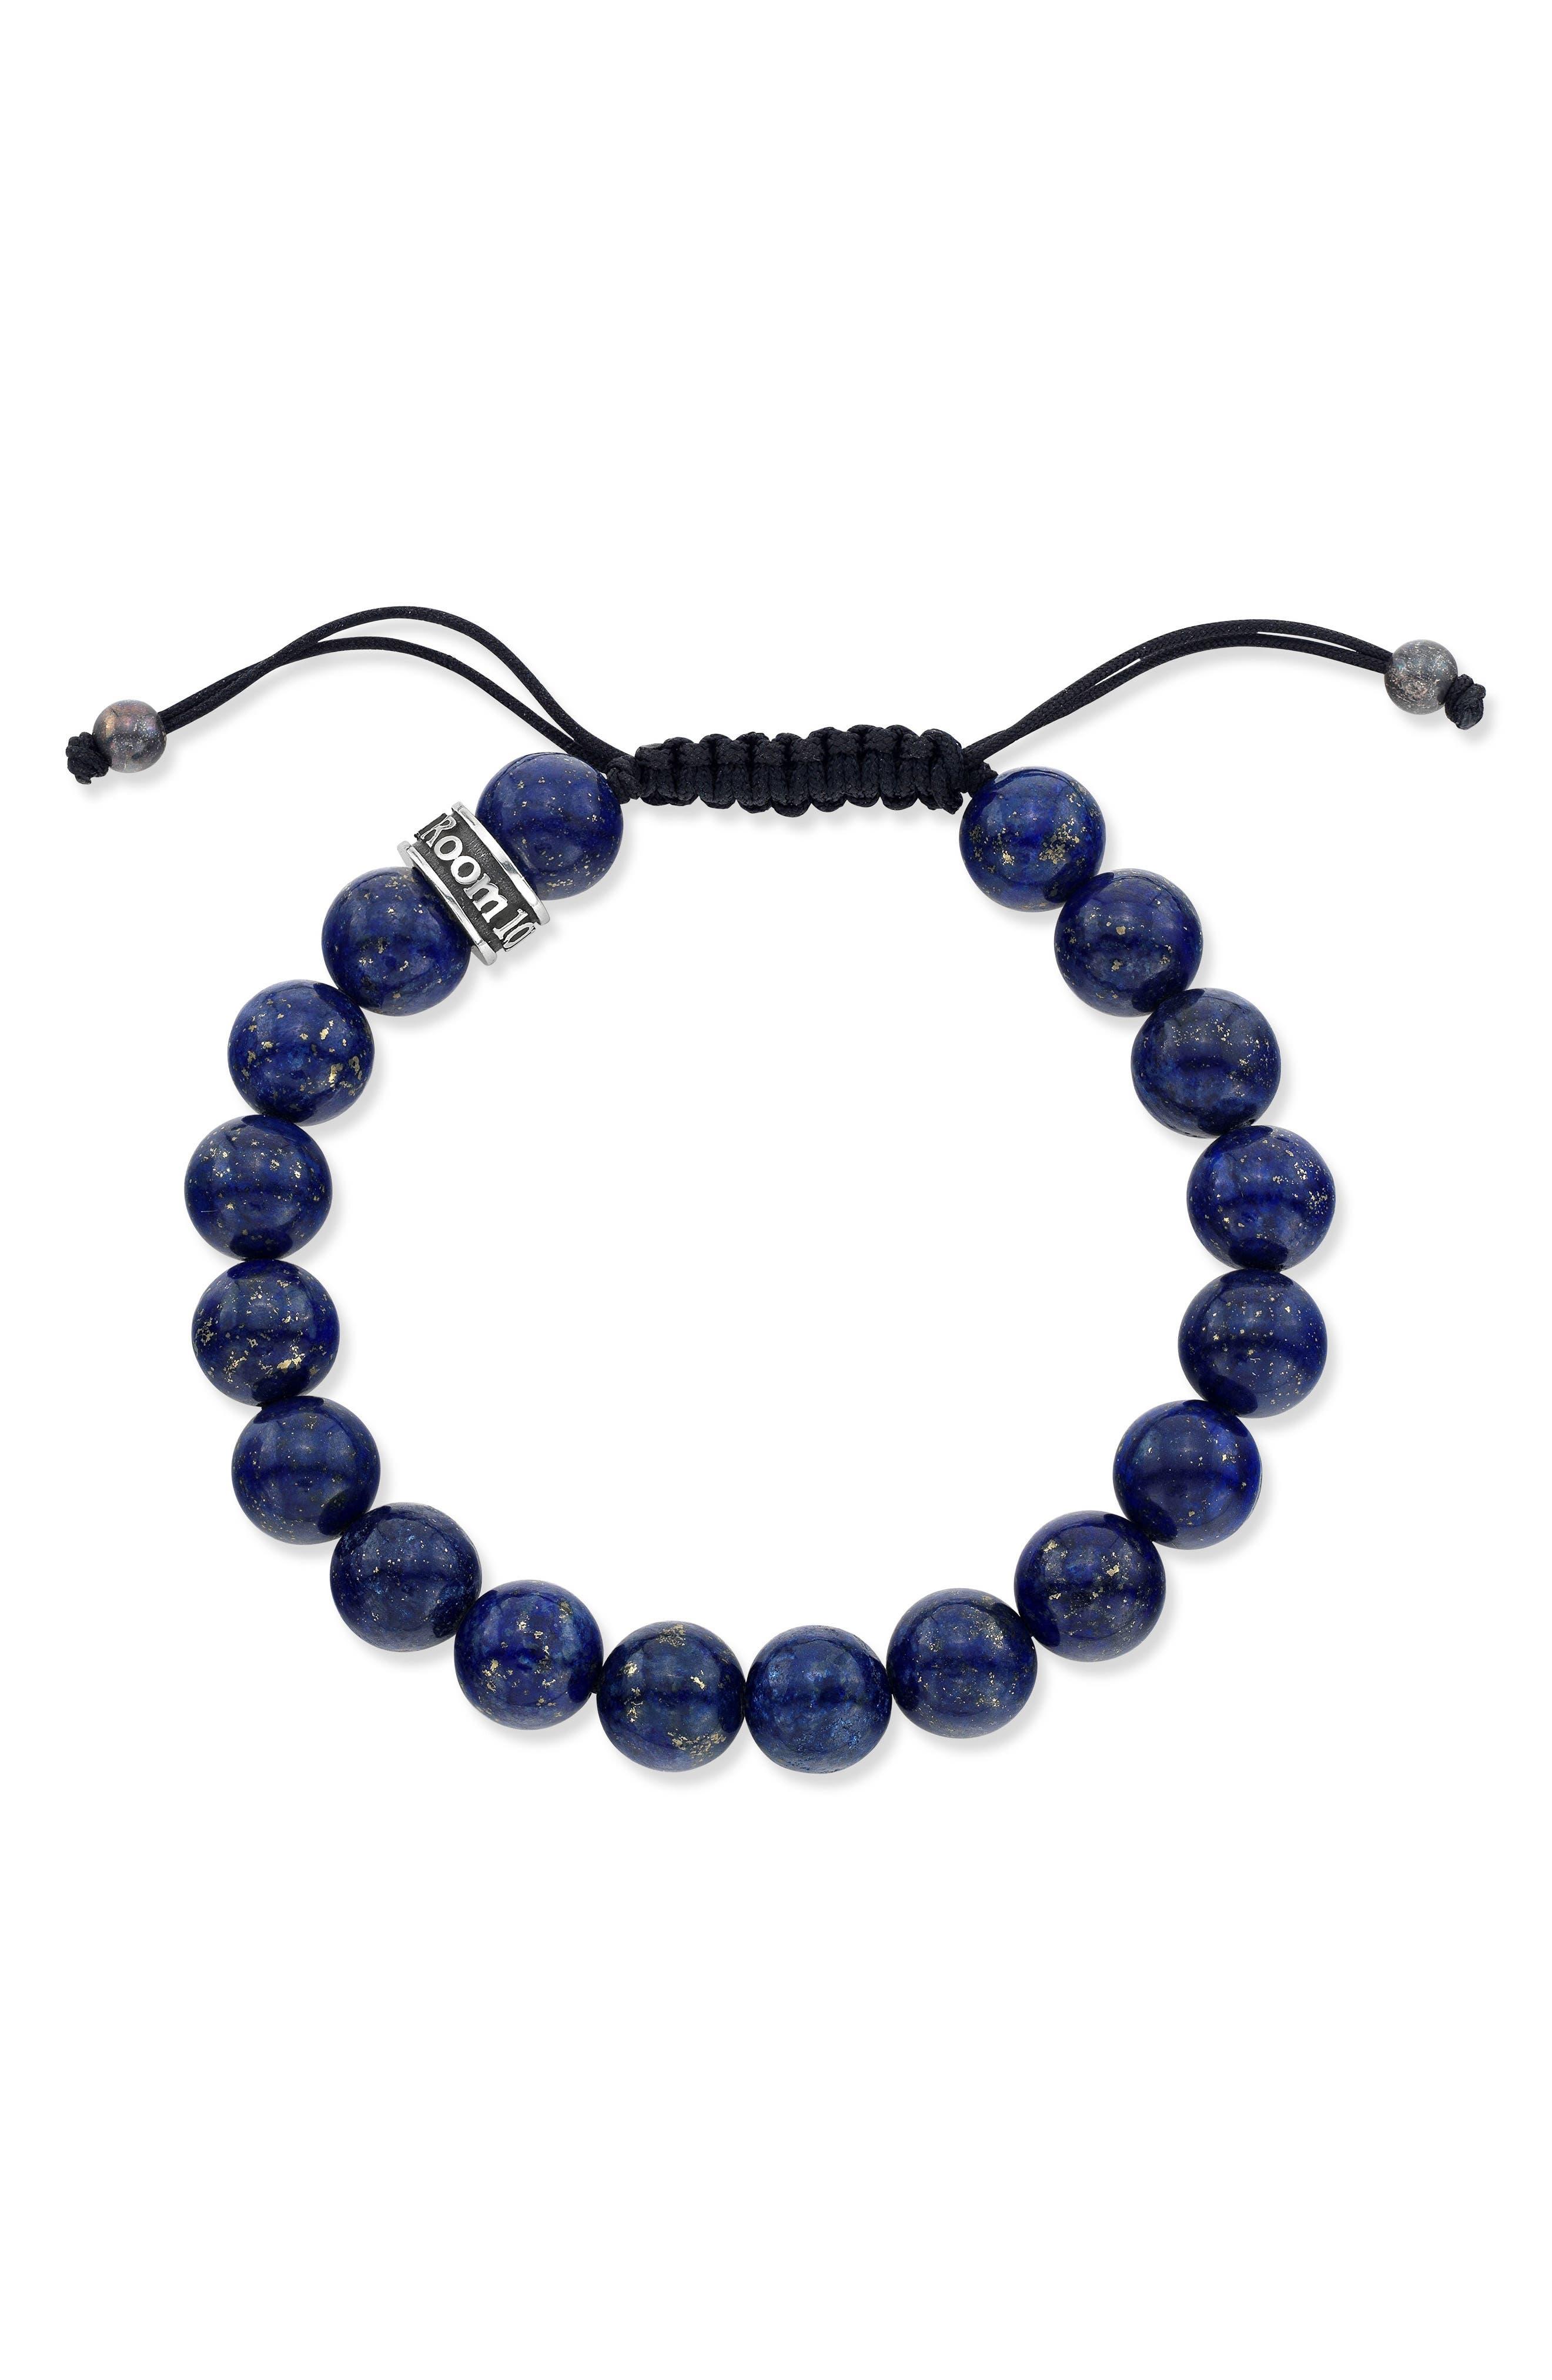 Lapis Lazuli Bead Shamballa Bracelet,                             Main thumbnail 1, color,                             Blue